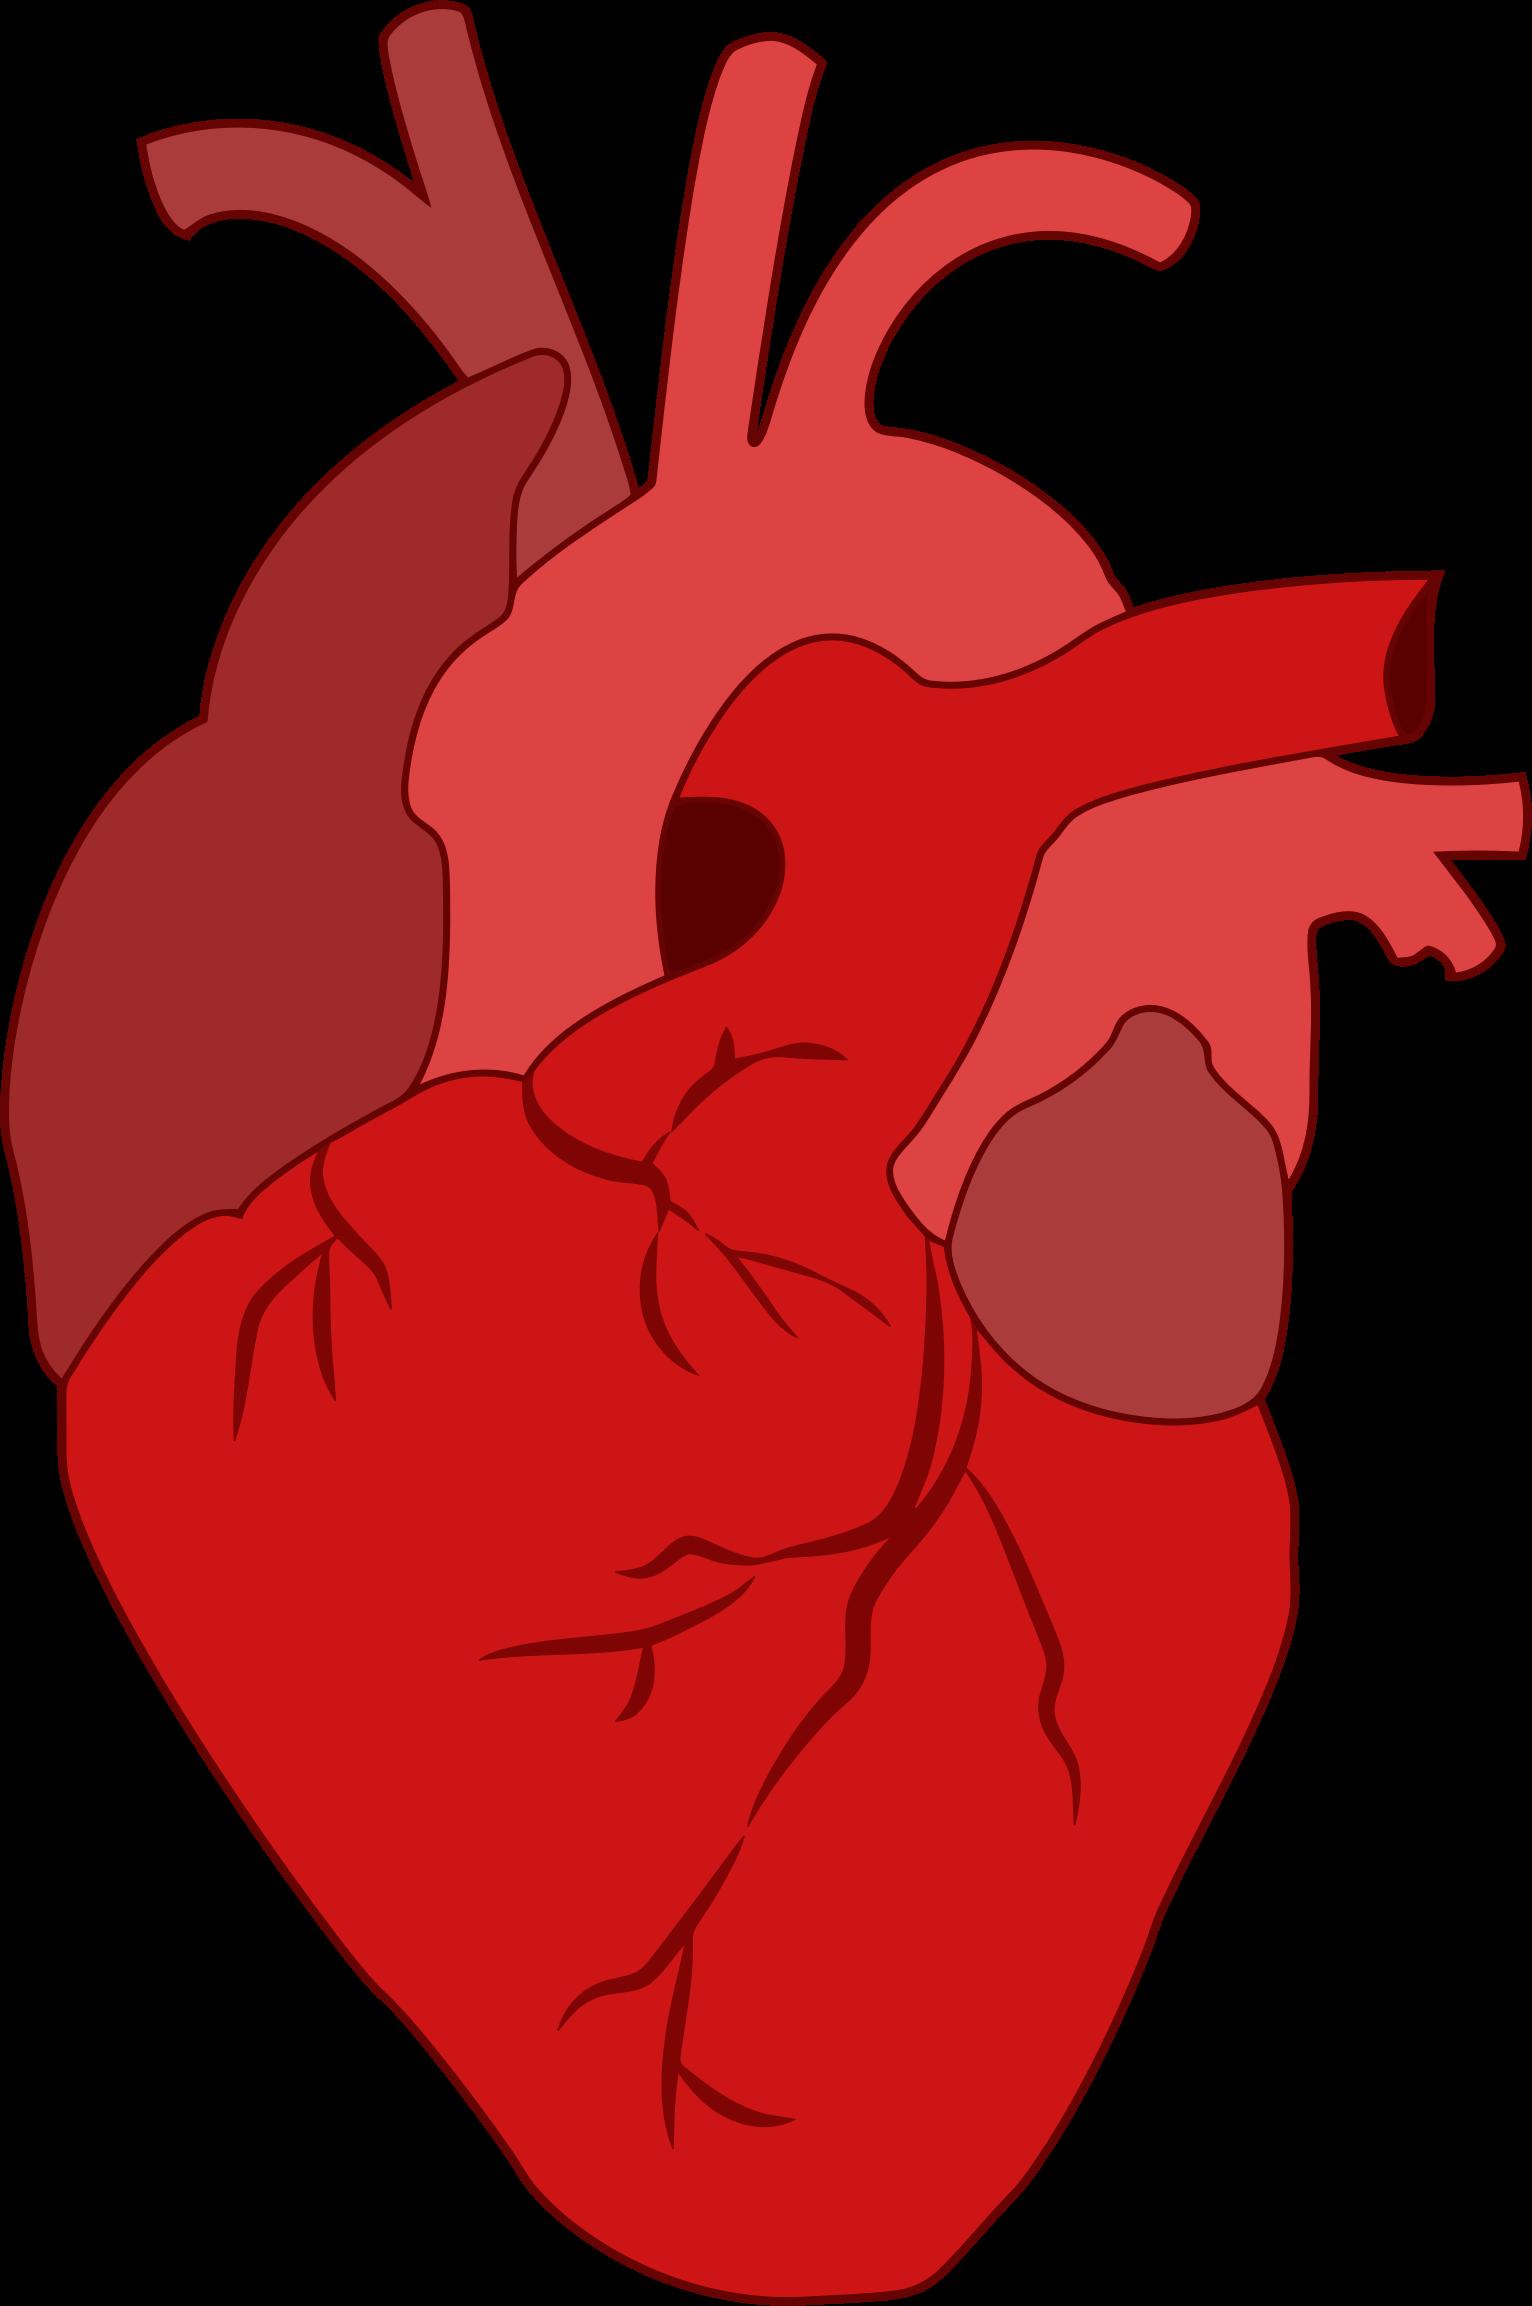 Heart Real Drawing